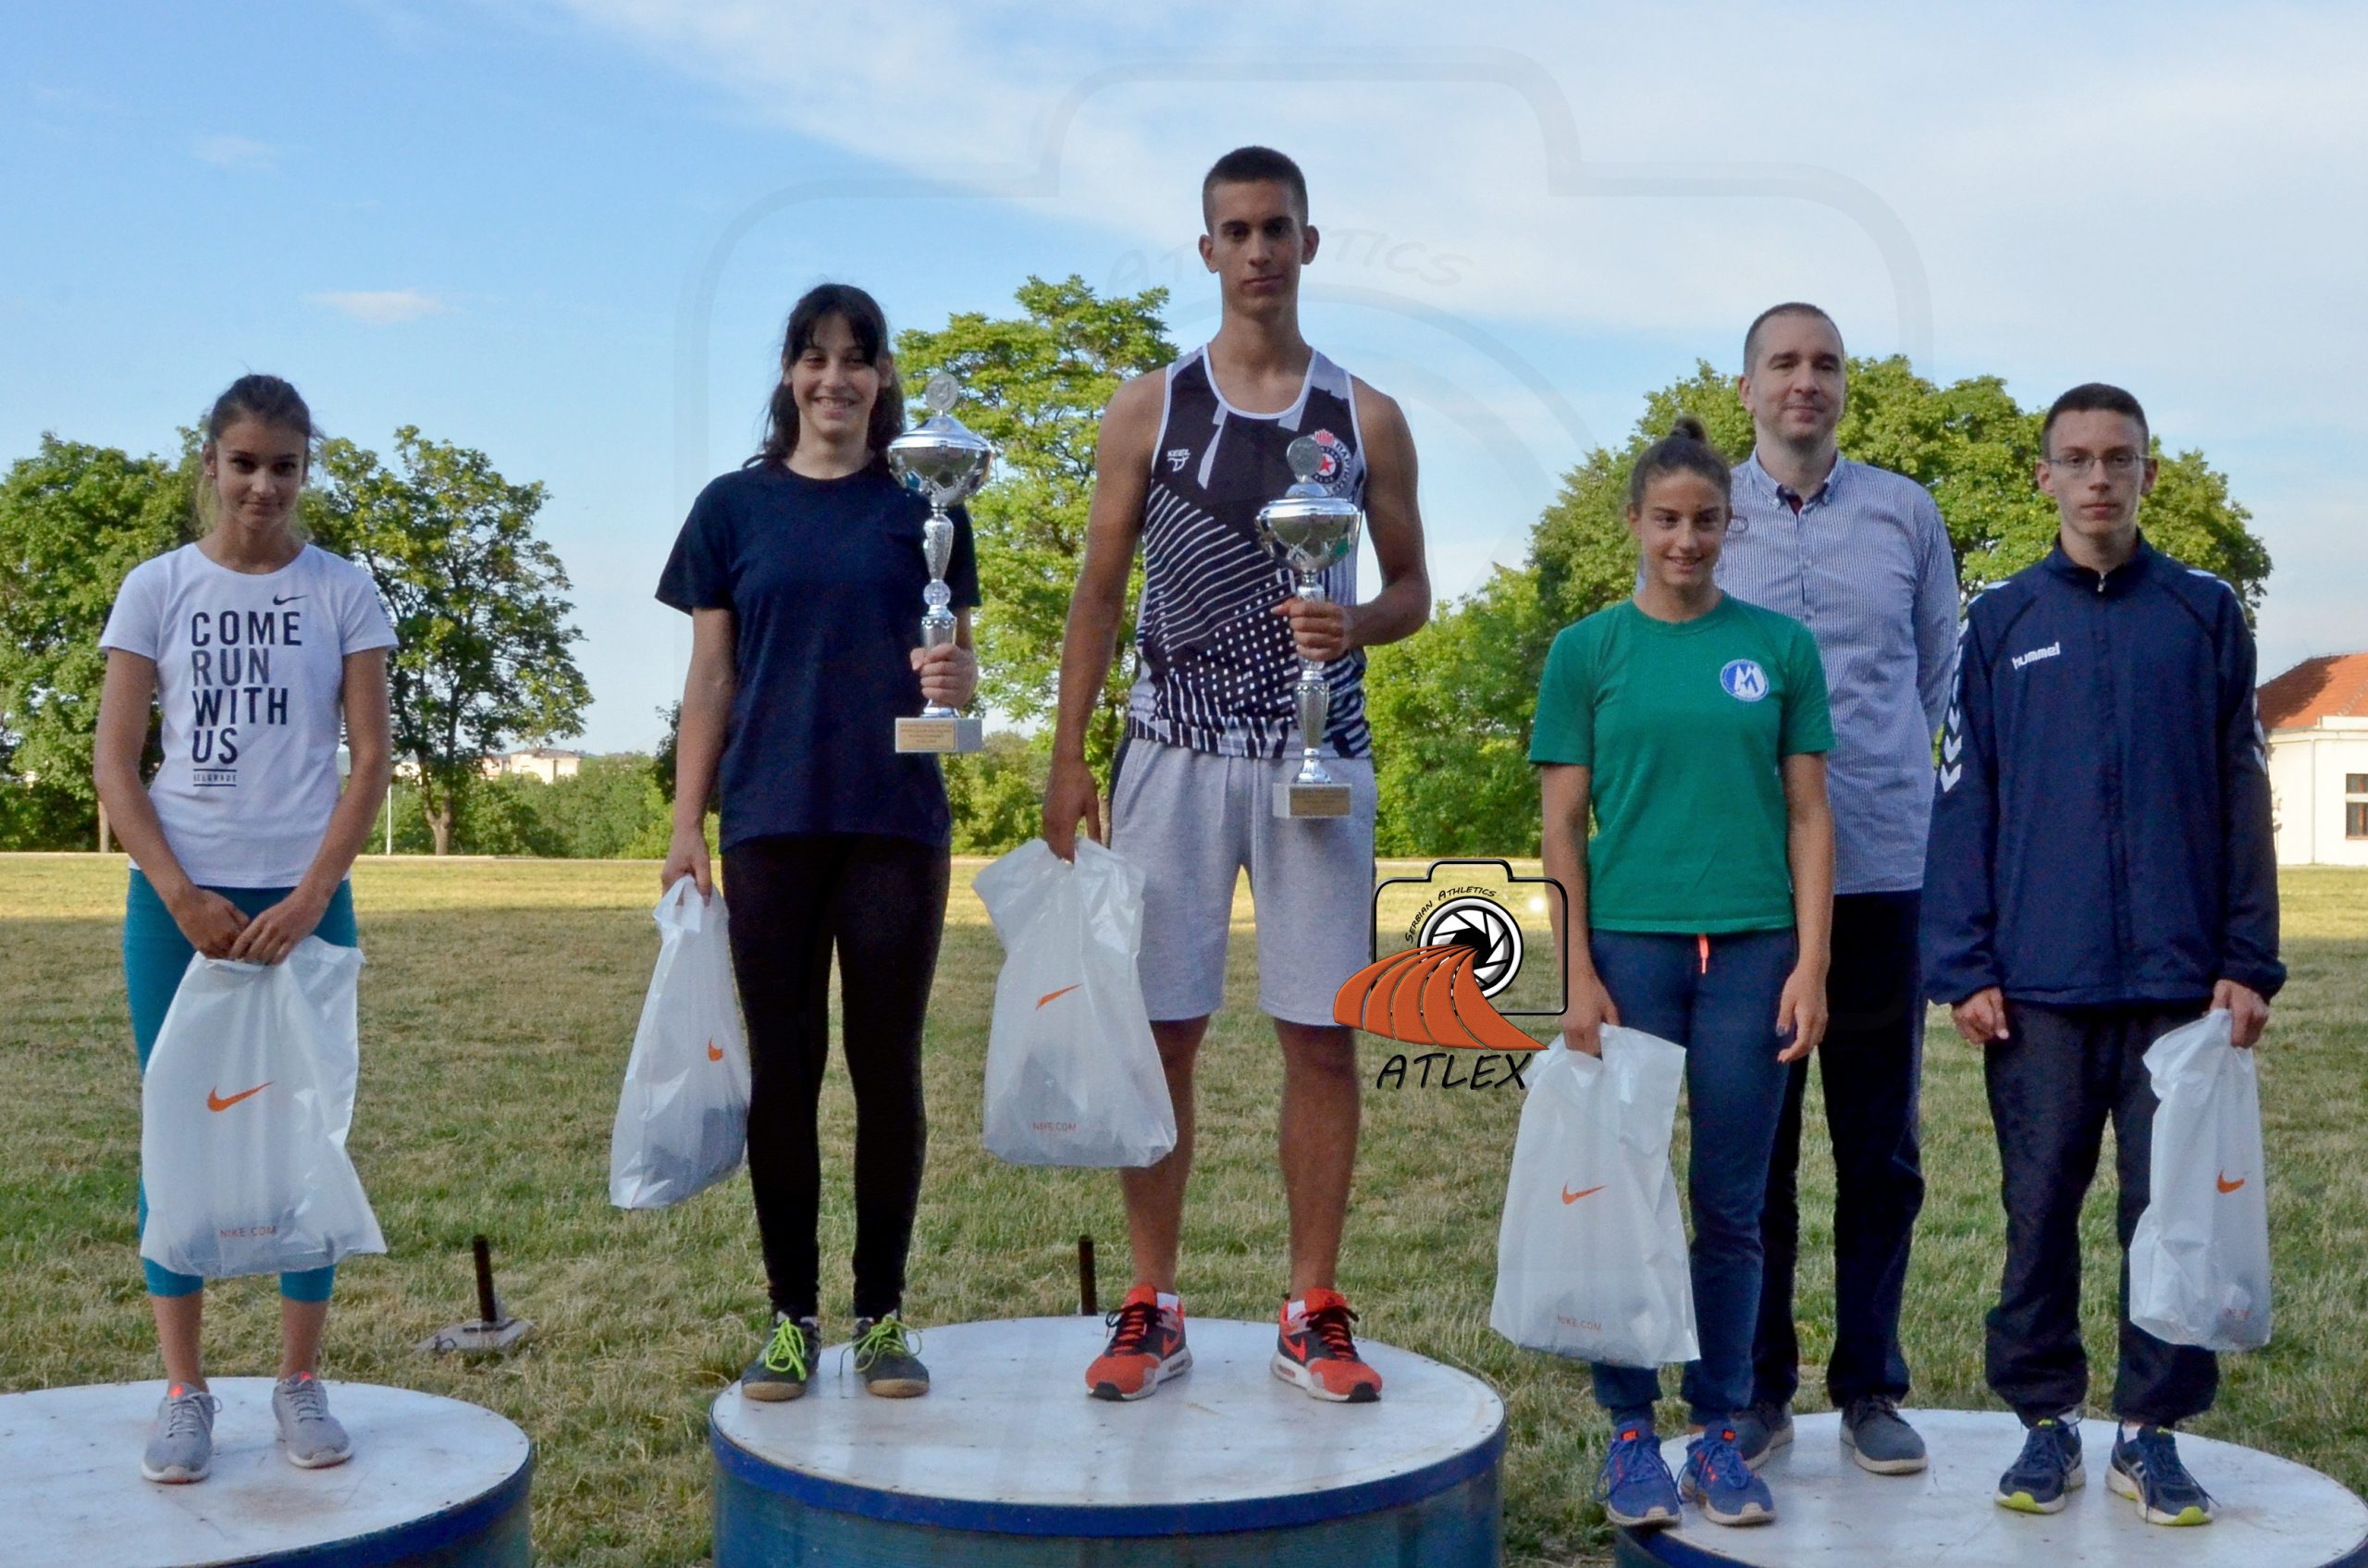 Trofej Beograda 2018 - najuspešniji